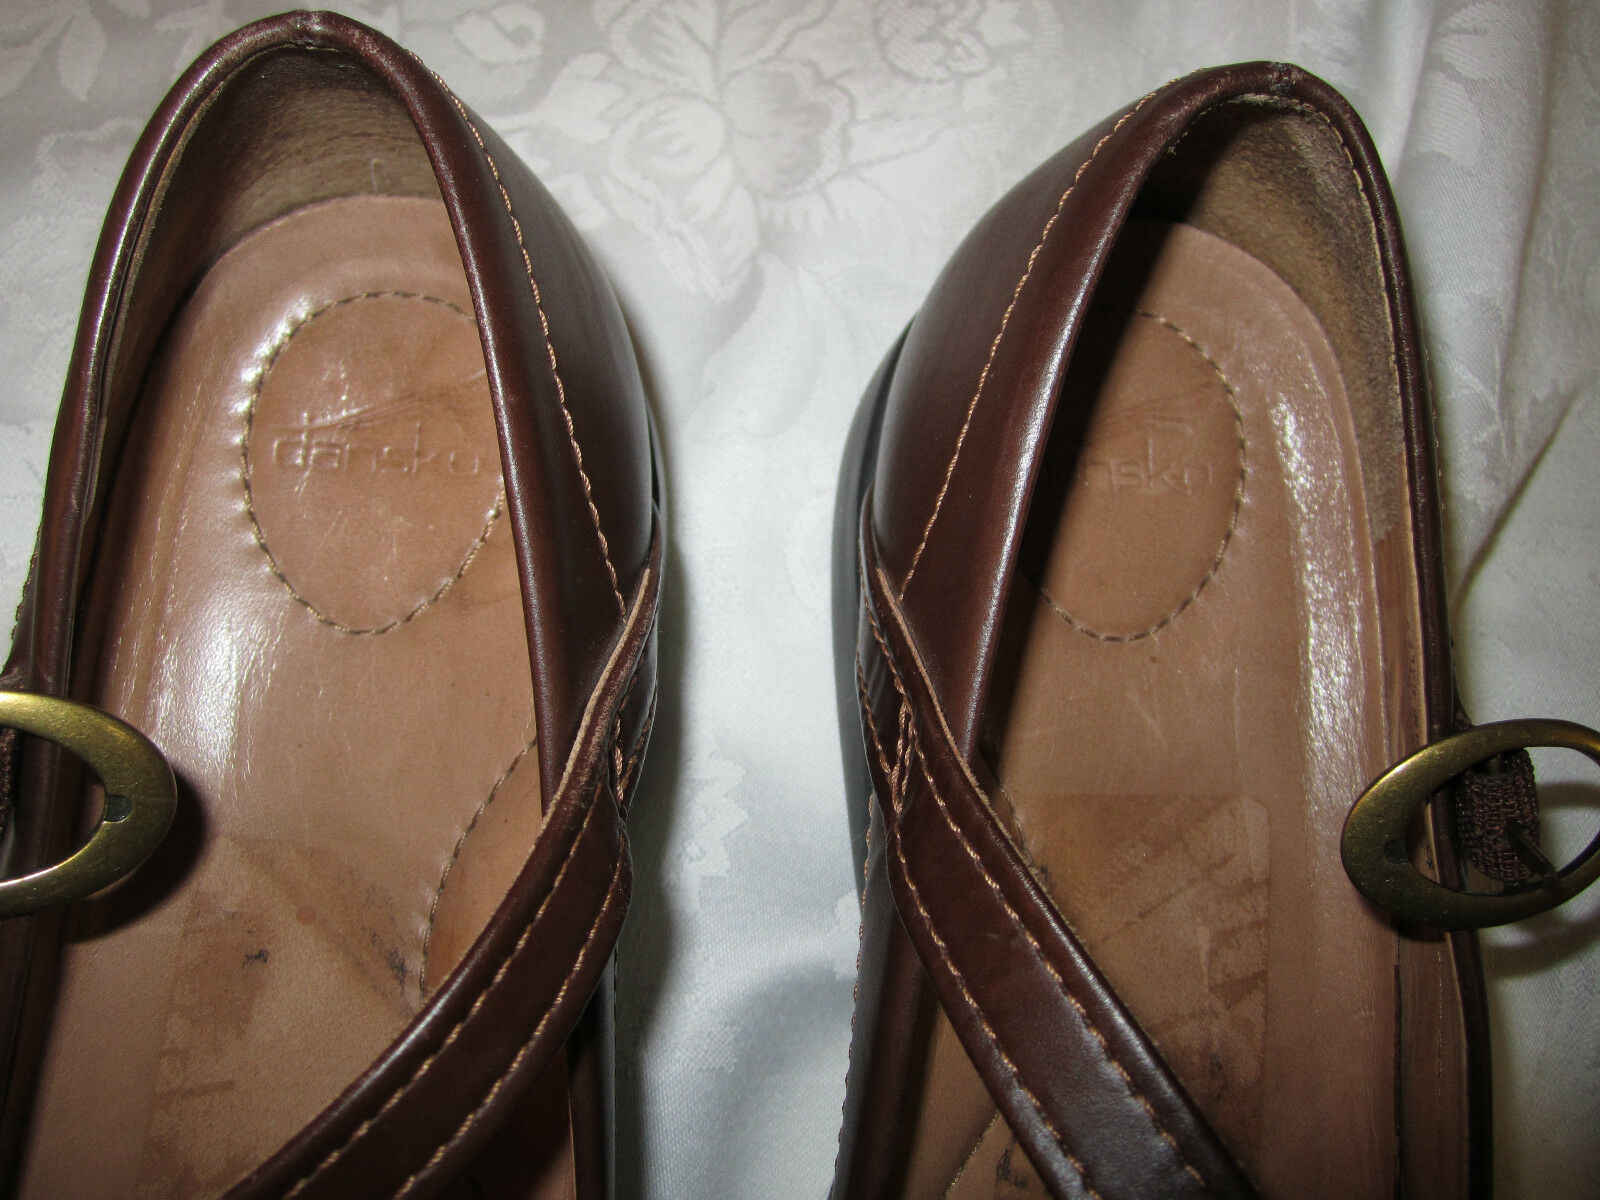 Dansko Damens's Dark Mary Jane Schuhes Beautiful Dark Damens's Braun Leder  Größe 41 EUC 19a889